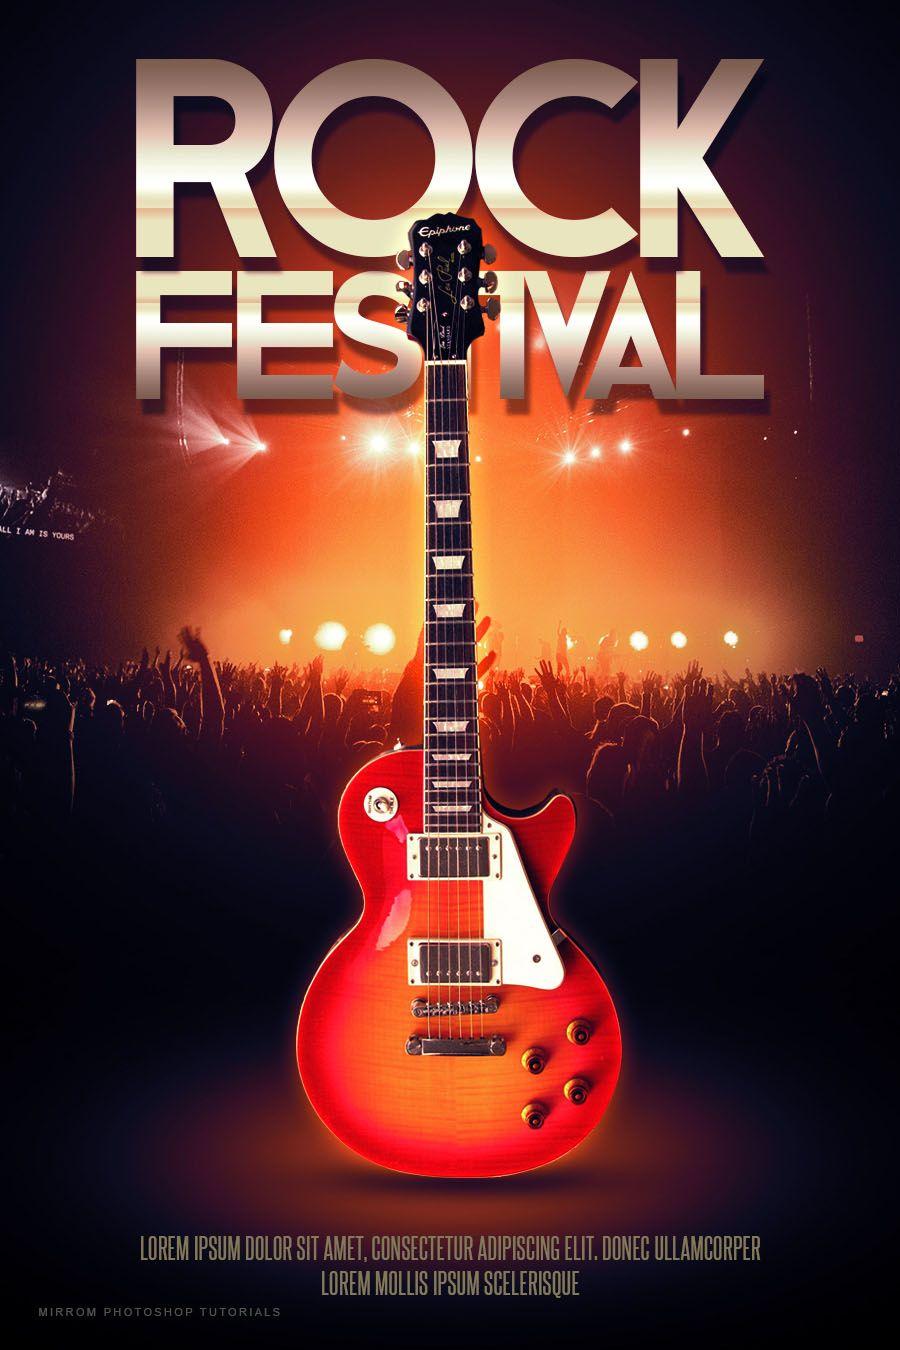 create a rock festival poster design in